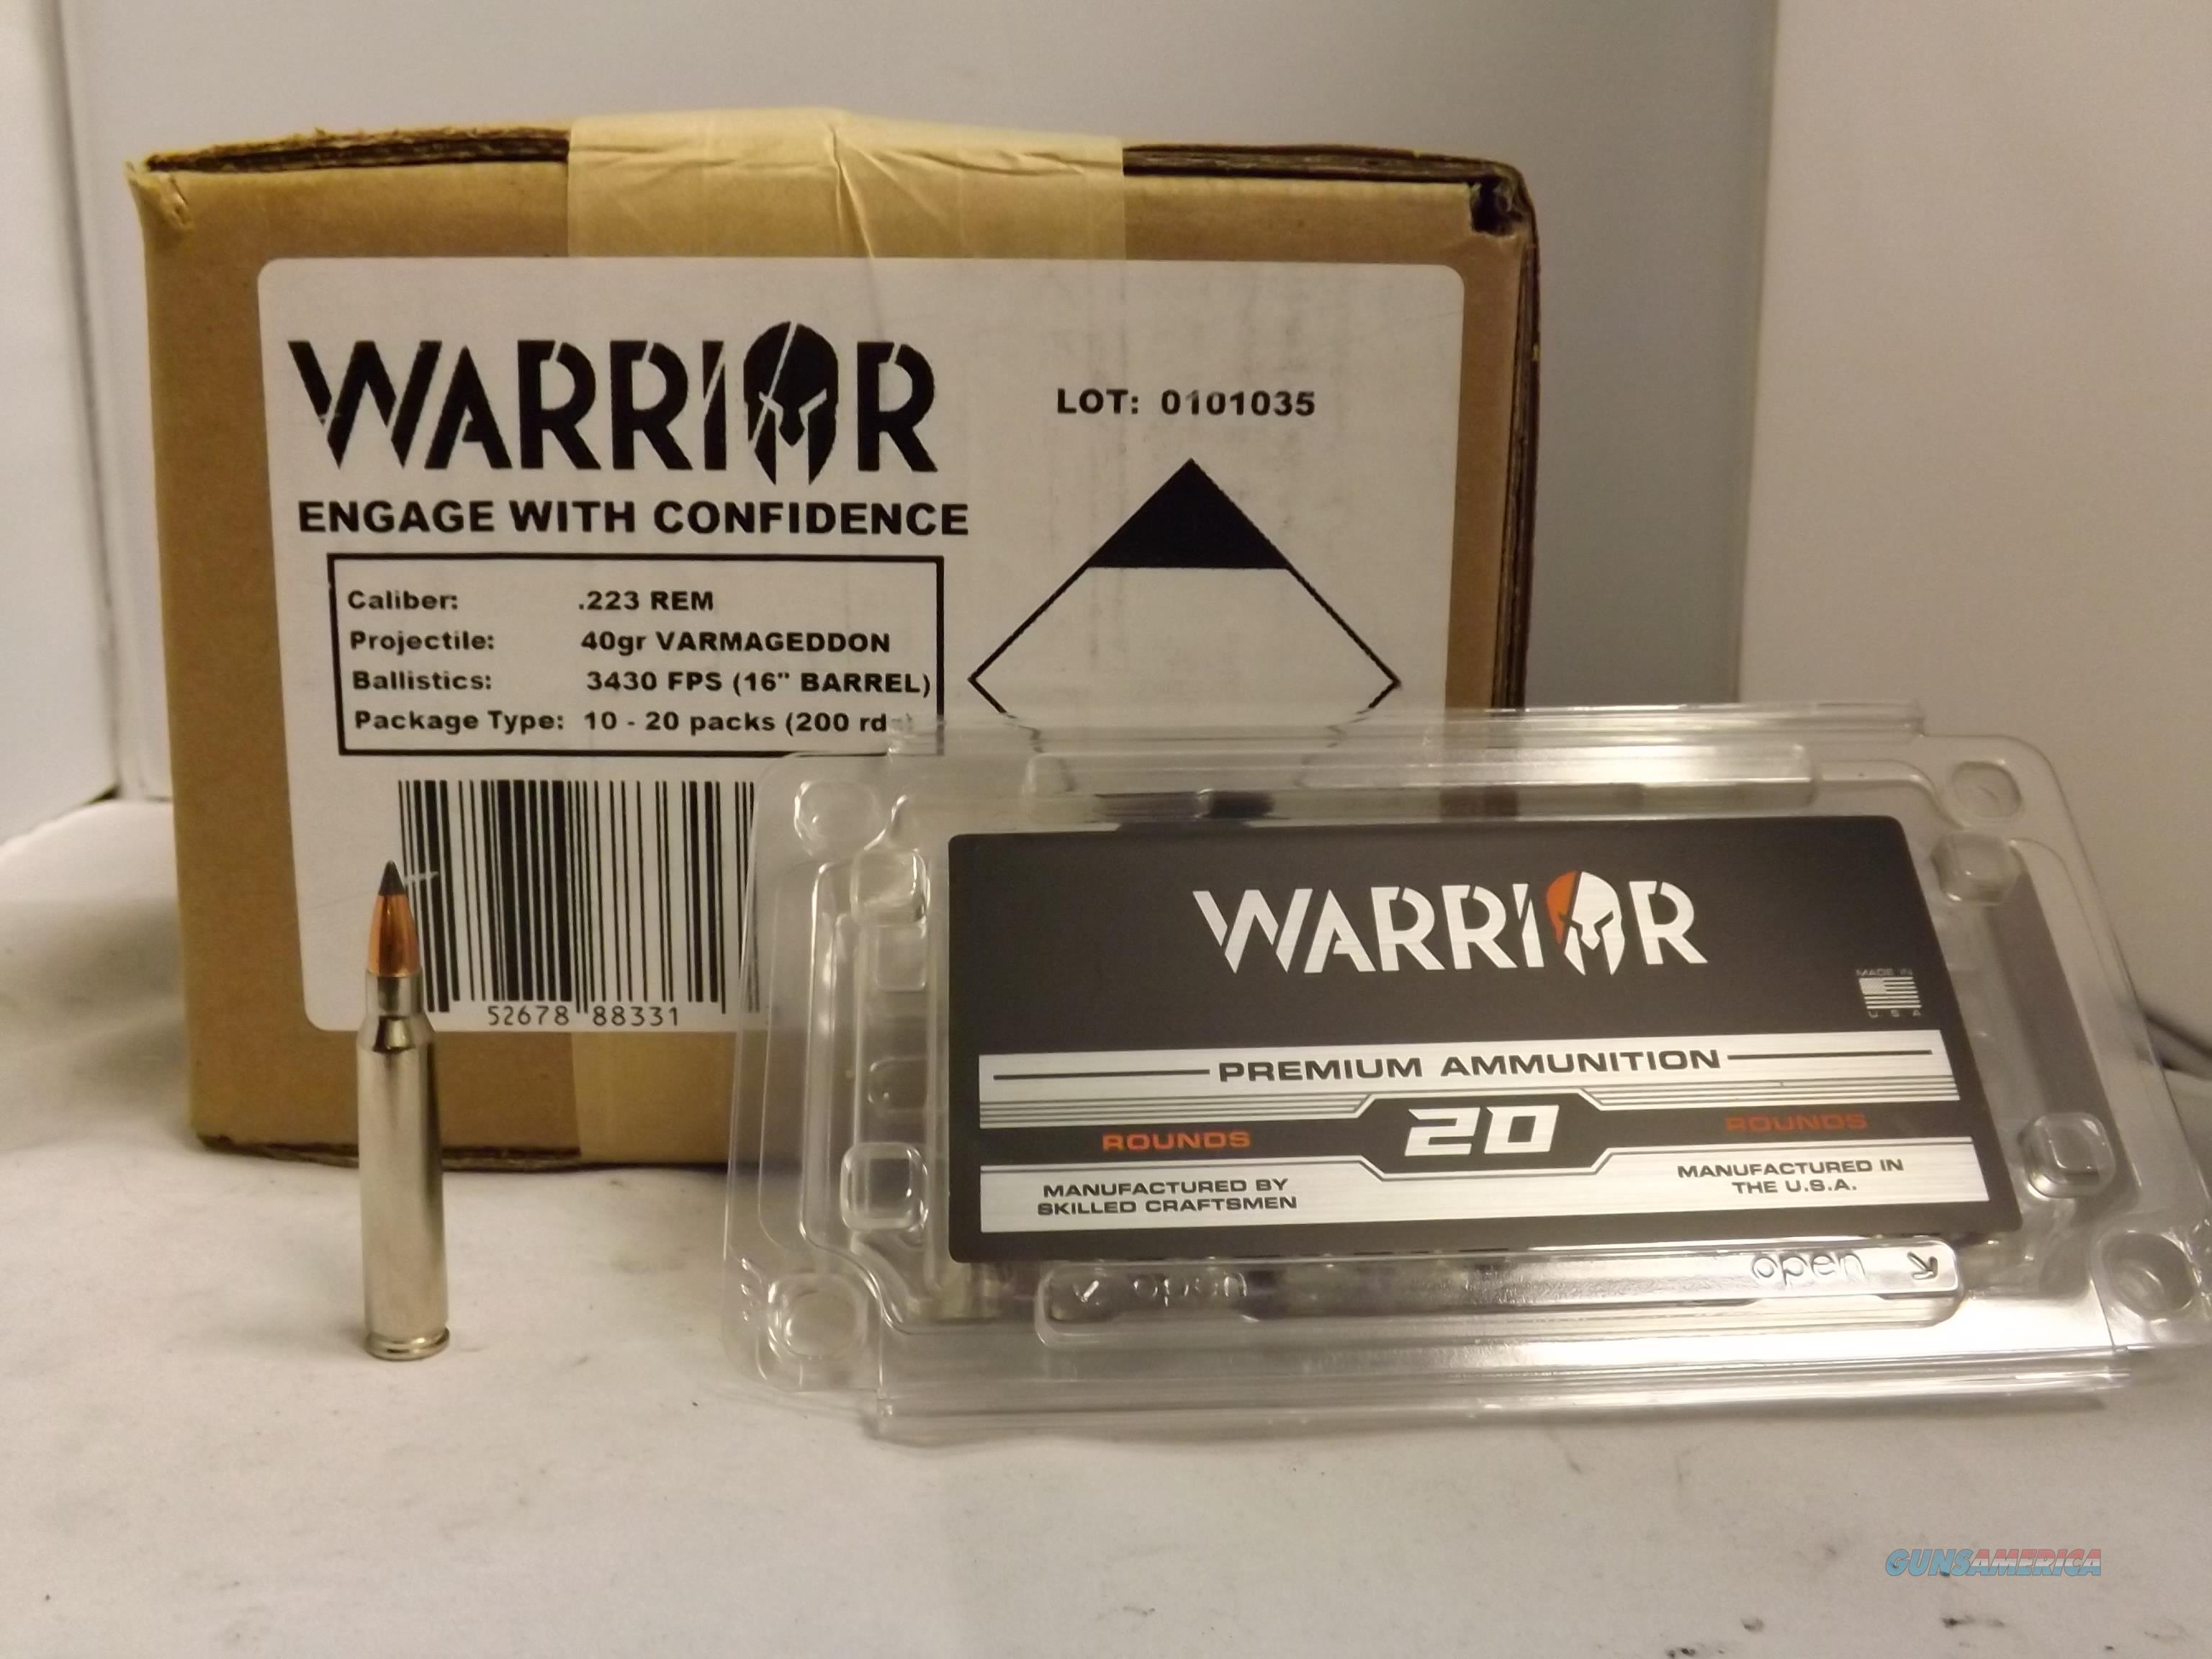 WARRIOR FACTORY NEW 223 REM - 40 GRAIN - NOSLER VARMAGEDDON - CASE OF 200 -  NICKEL PLATED BRASS / BLACK PERFORMANCE COATED BULLET